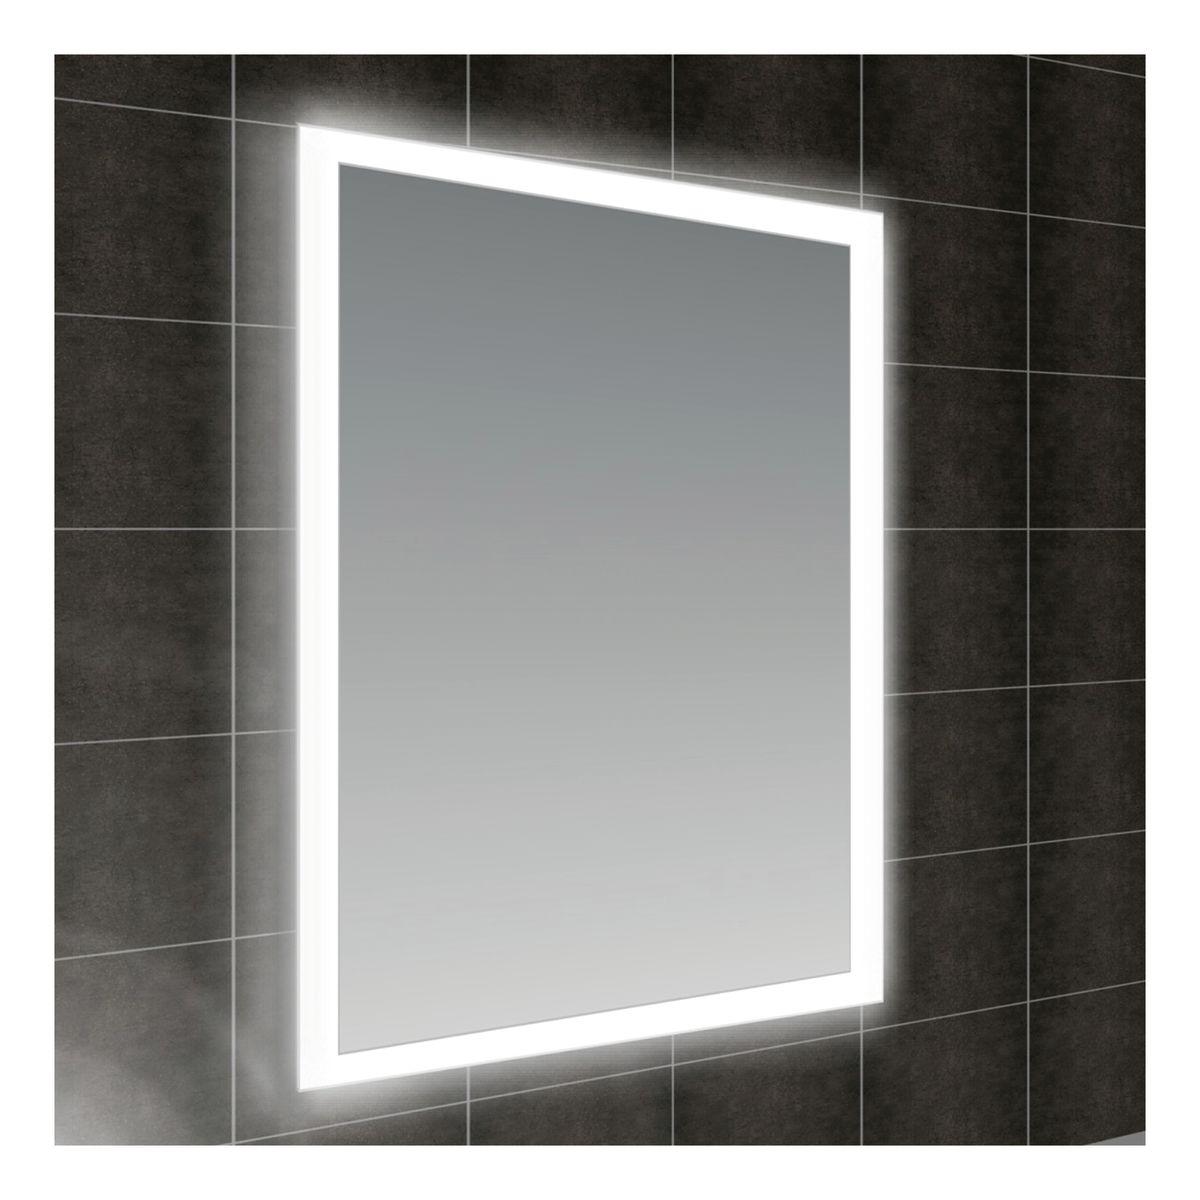 Sanitari bagno leroy merlin idee creative e innovative for Specchio bagno leroy merlin